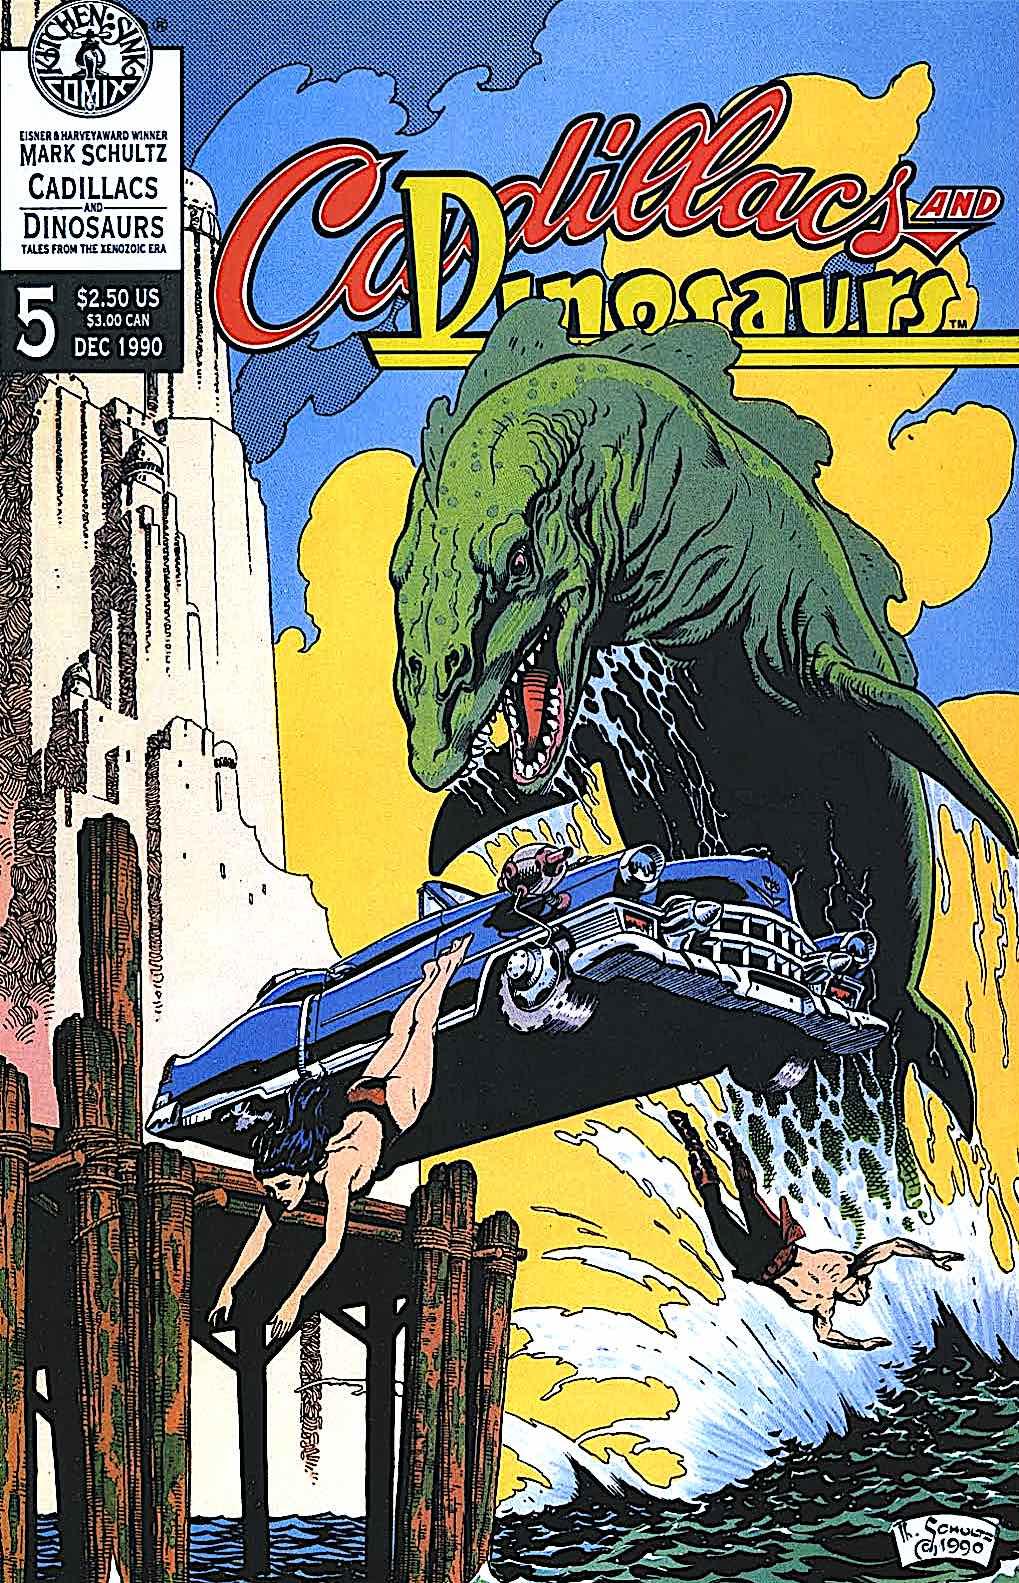 a 1990 Mark Schultz comic book, Cadillacs and Dinosaurs